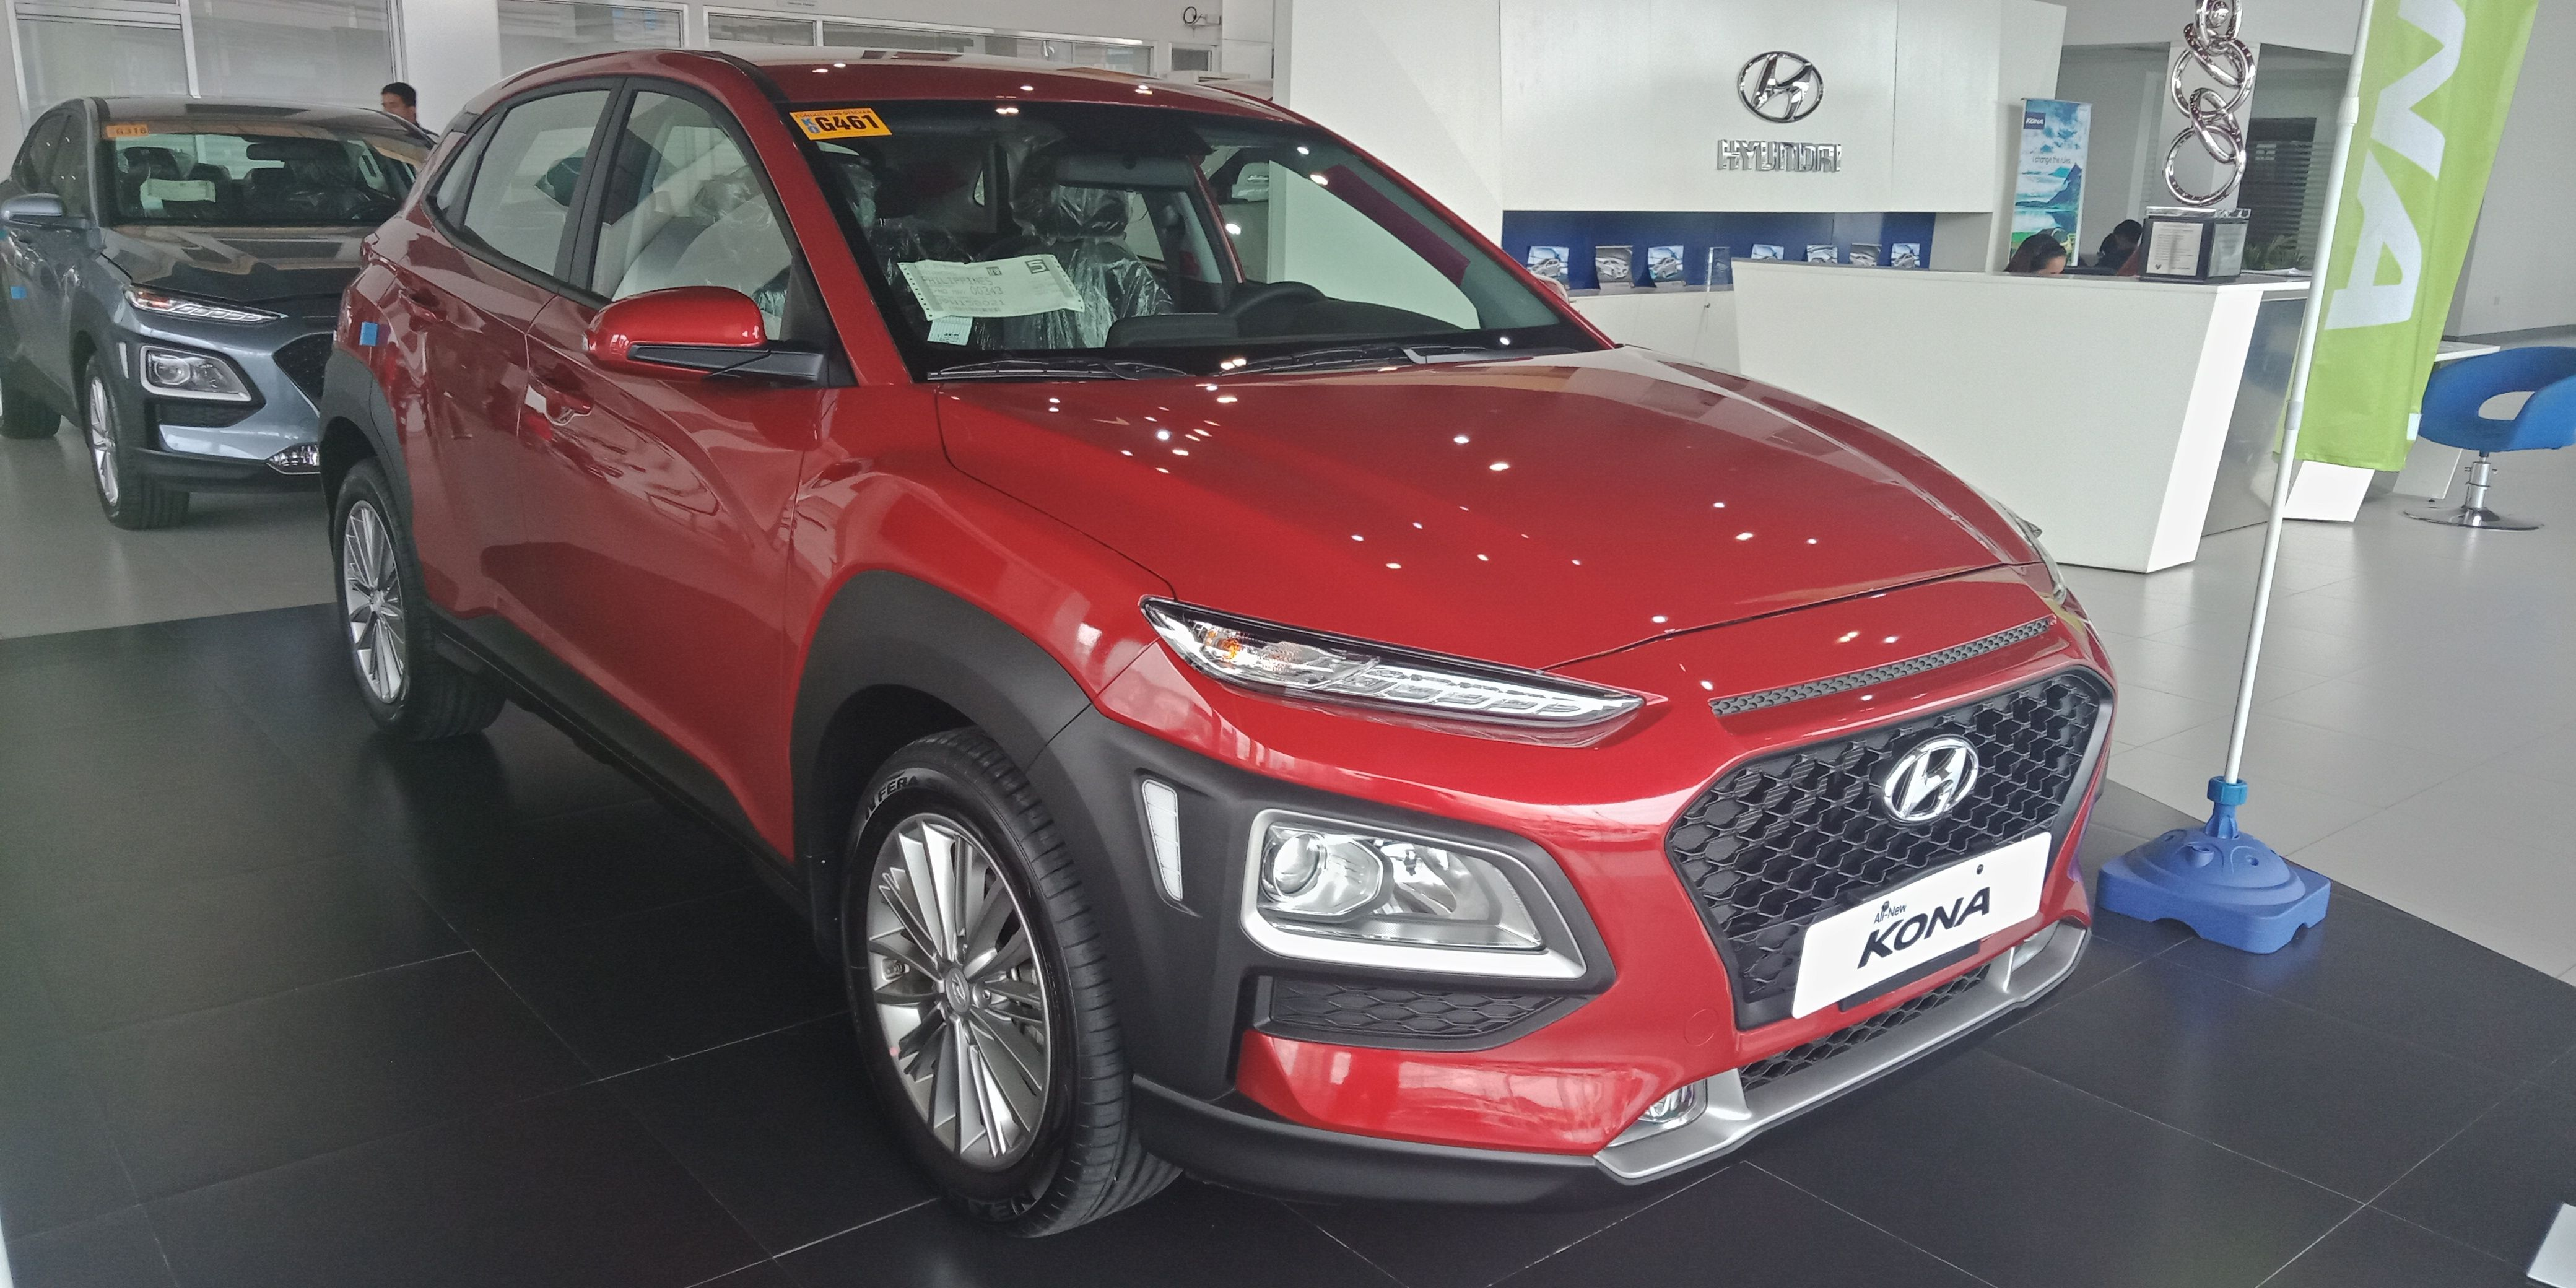 2018 Hyundai Kona 2.0 GLS 6A/T (With images) Hyundai